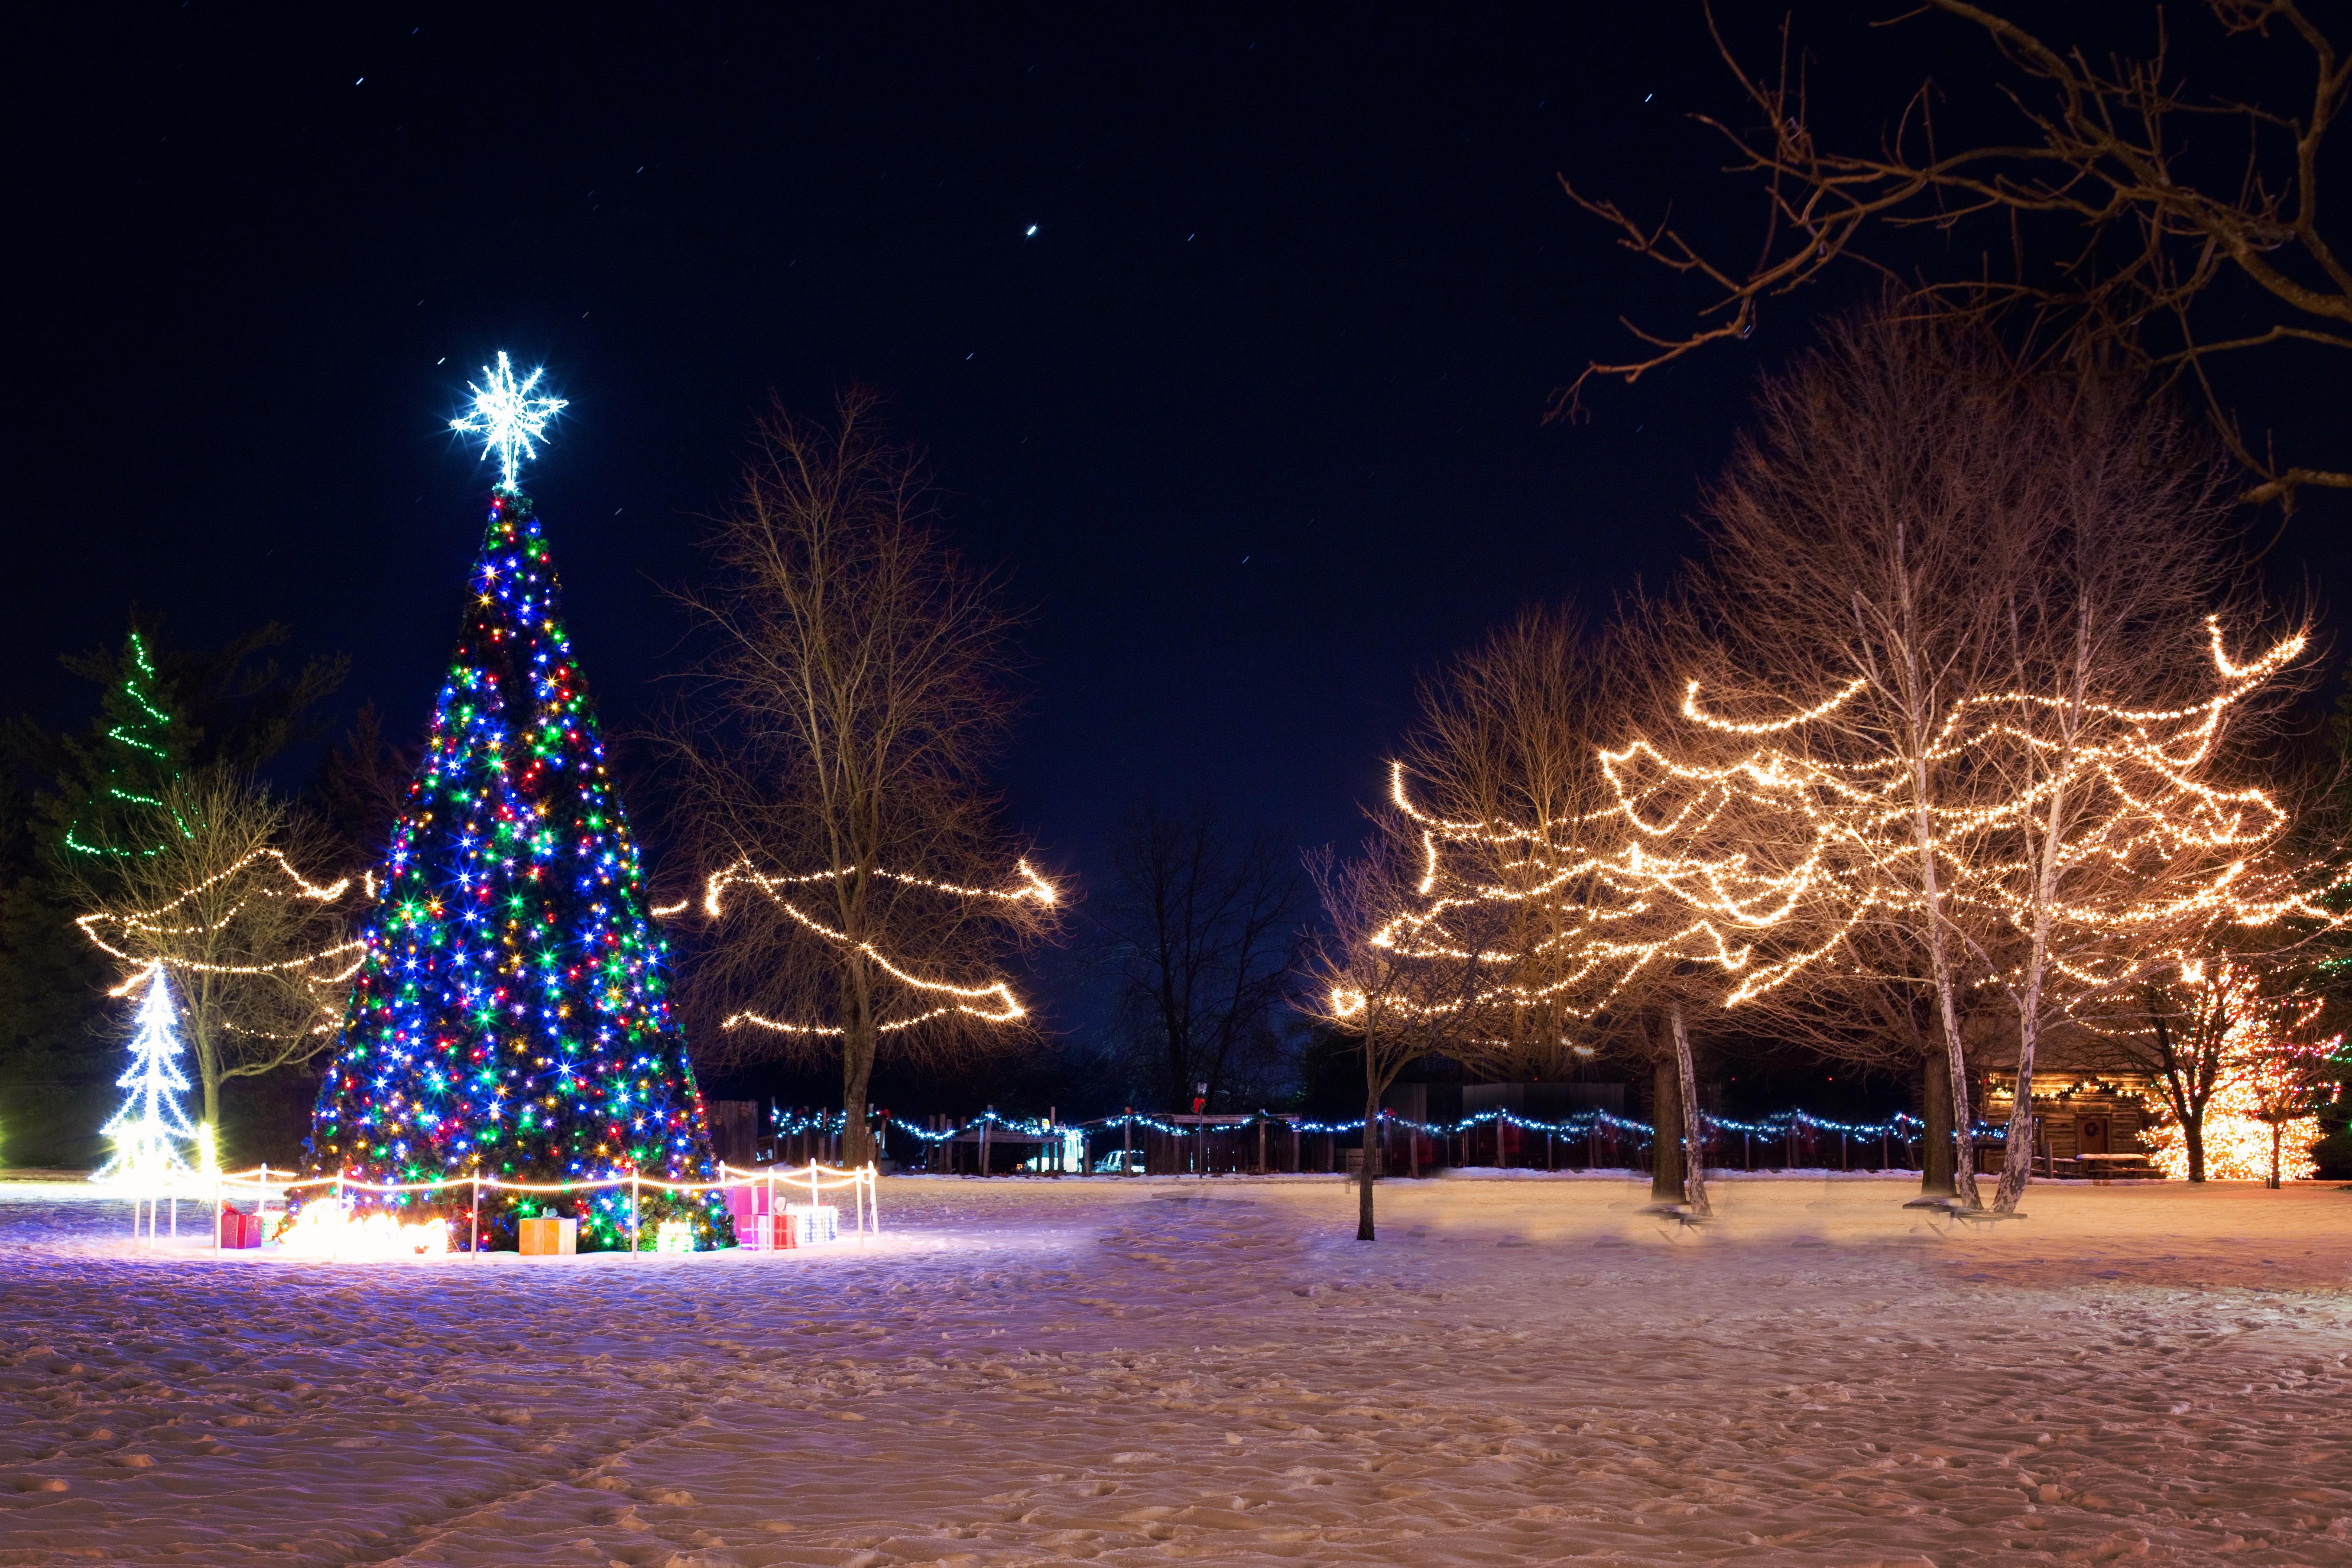 Neon Christmas Tree and Lights and Decorations image ...